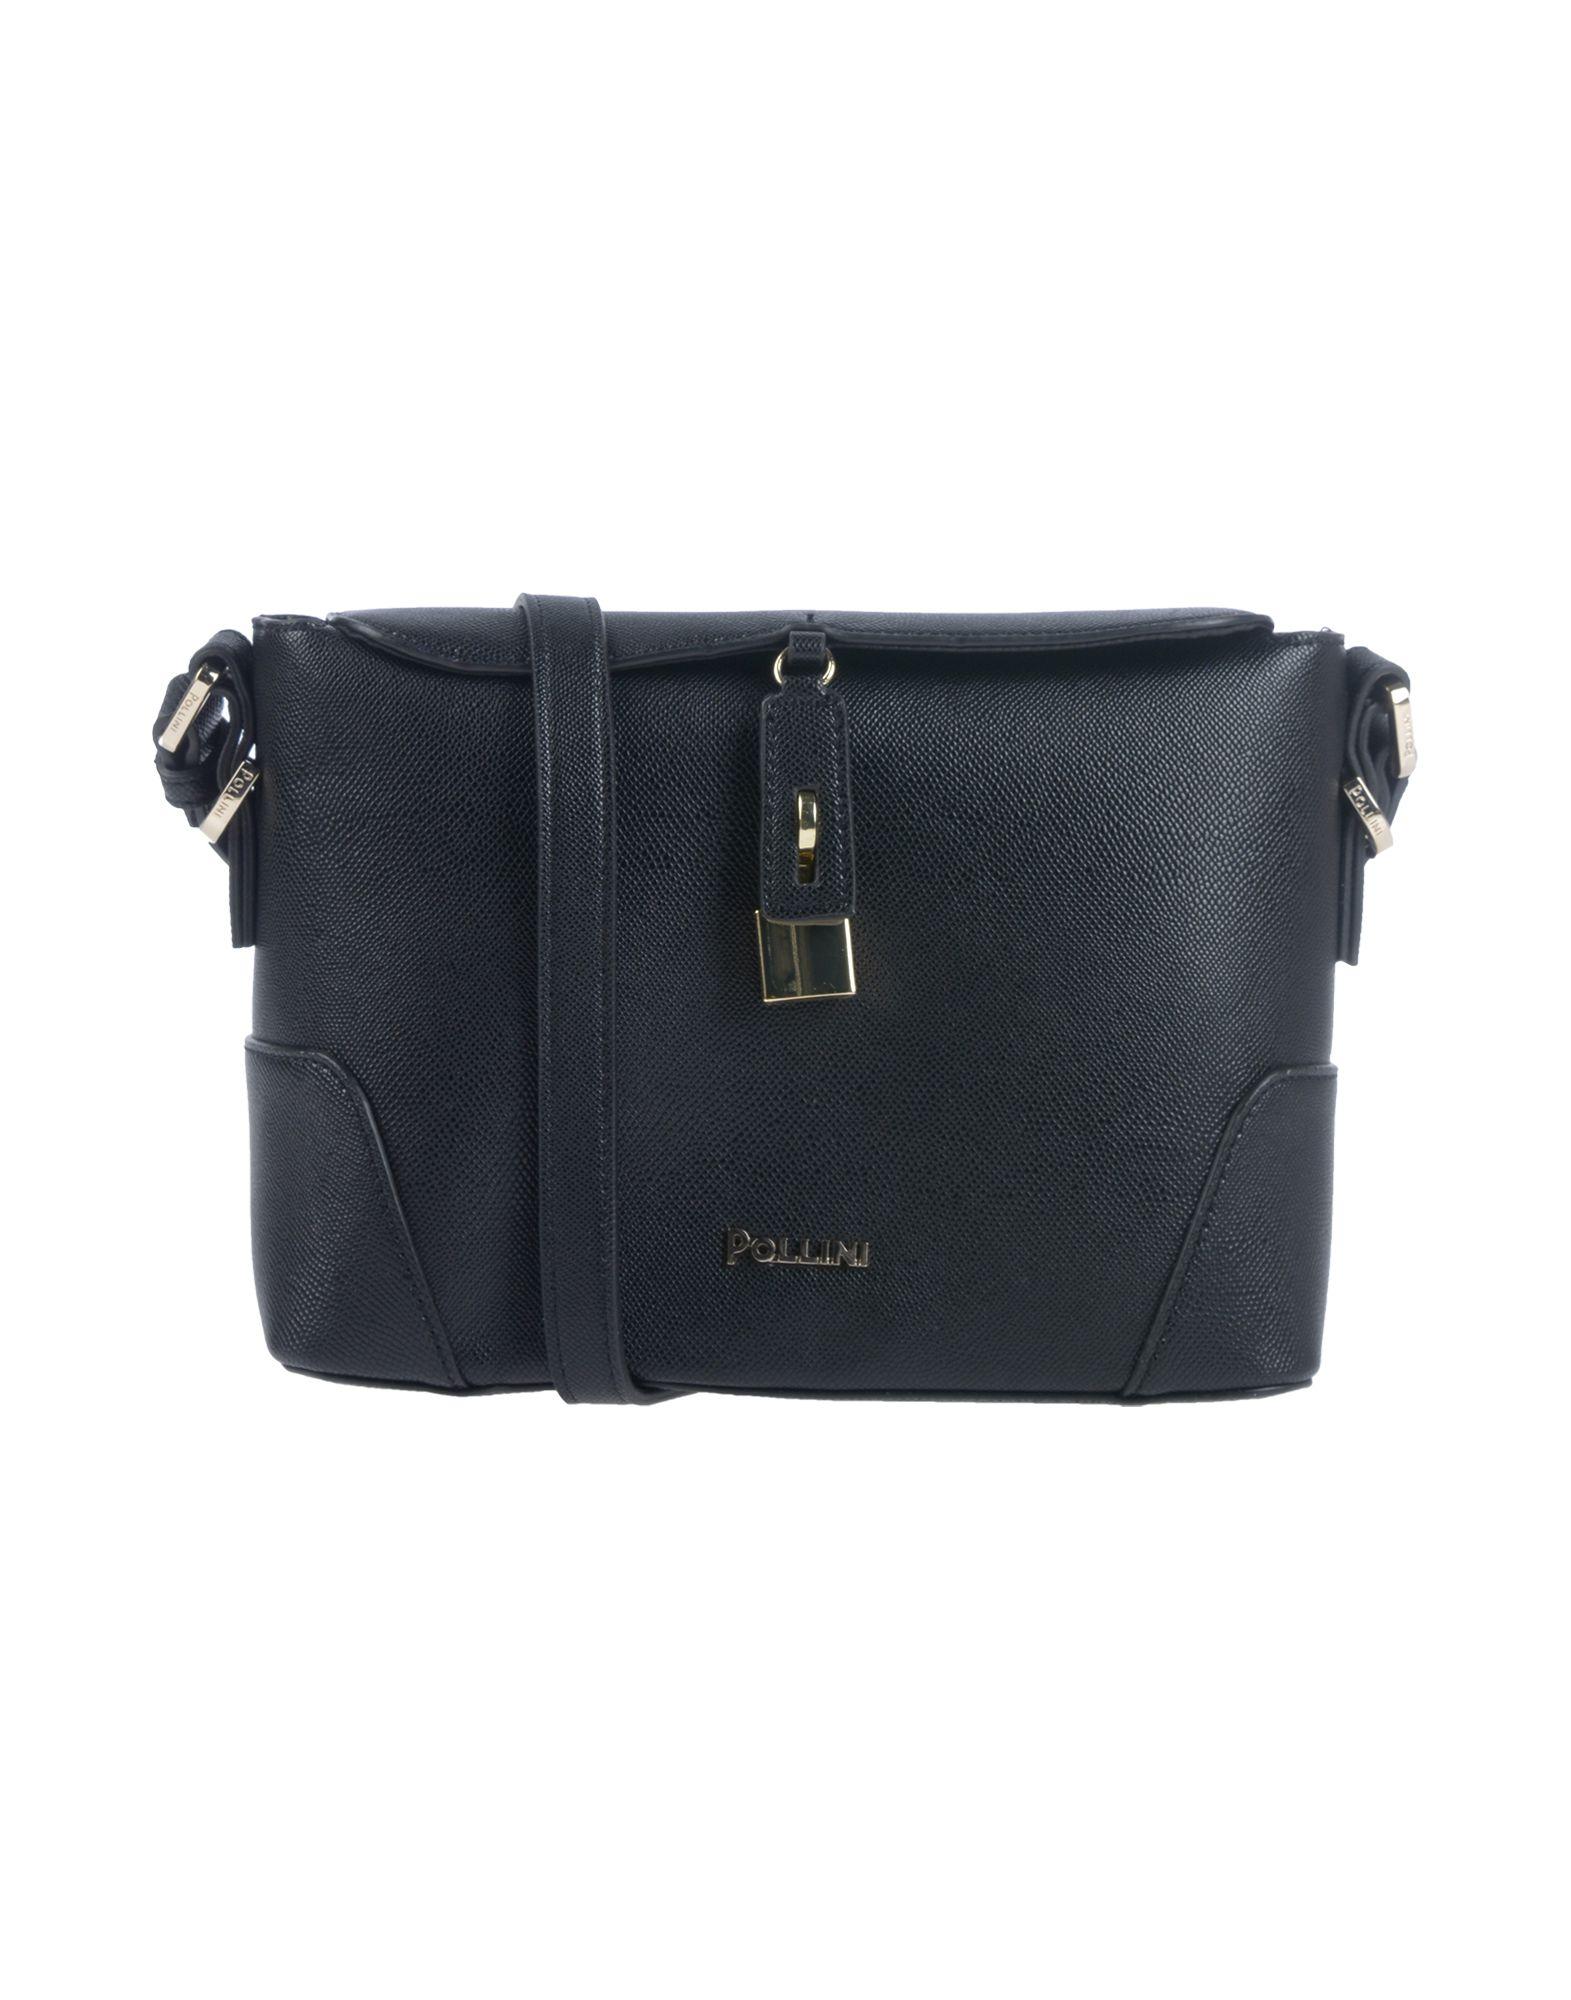 muzee парусиновая мужская сумка через плечо сумка на поясе POLLINI Сумка через плечо